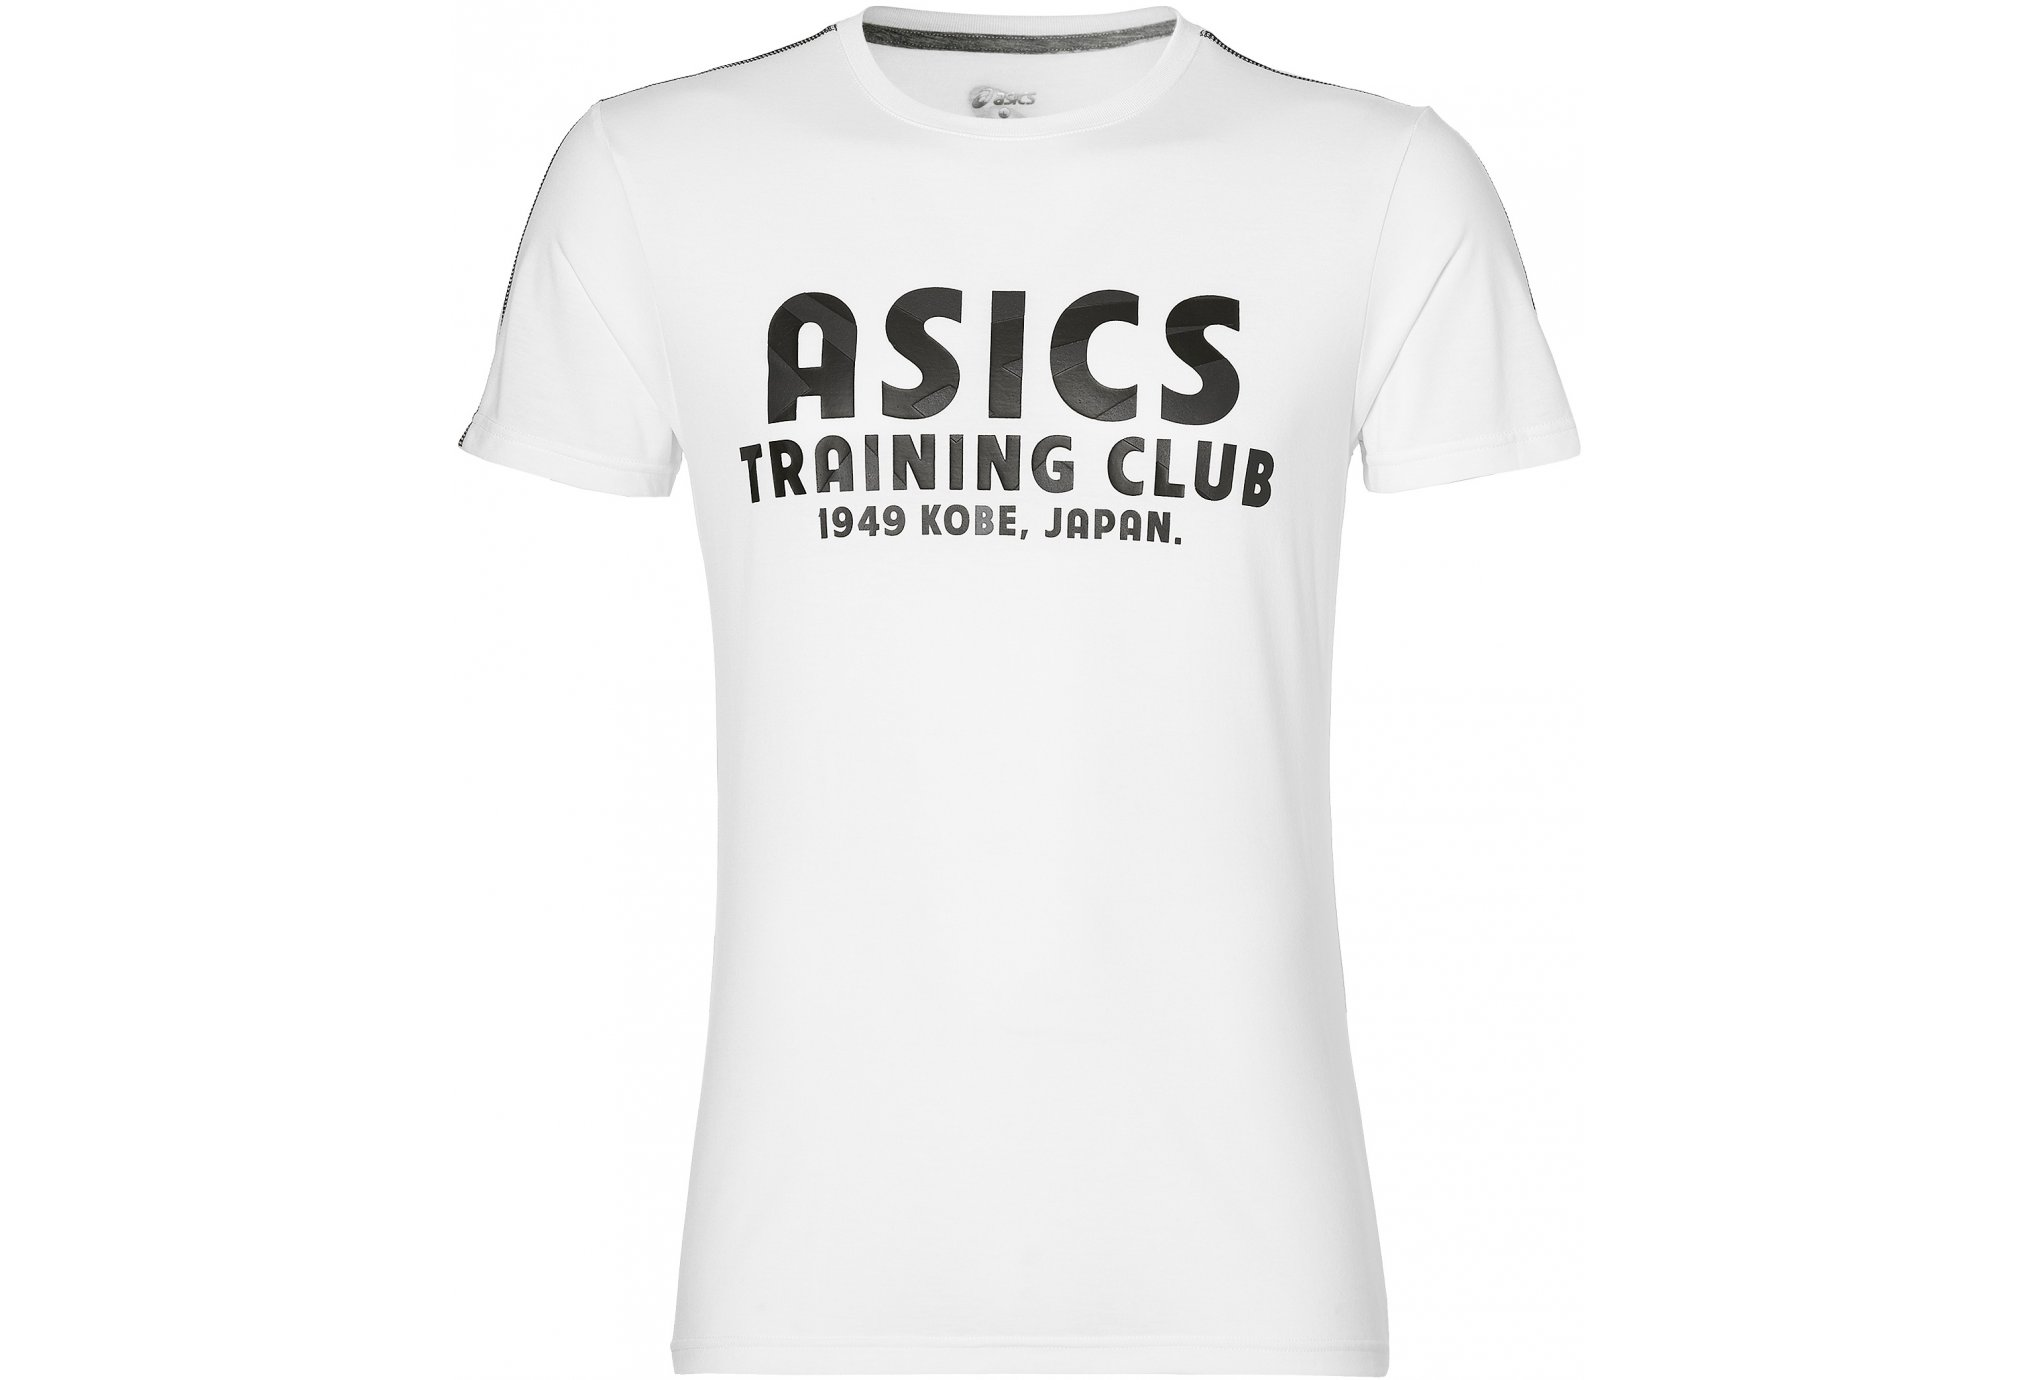 Cyclo randonneurs saint chamonais - Asics Training Club M Diététique ... b2e7f159584